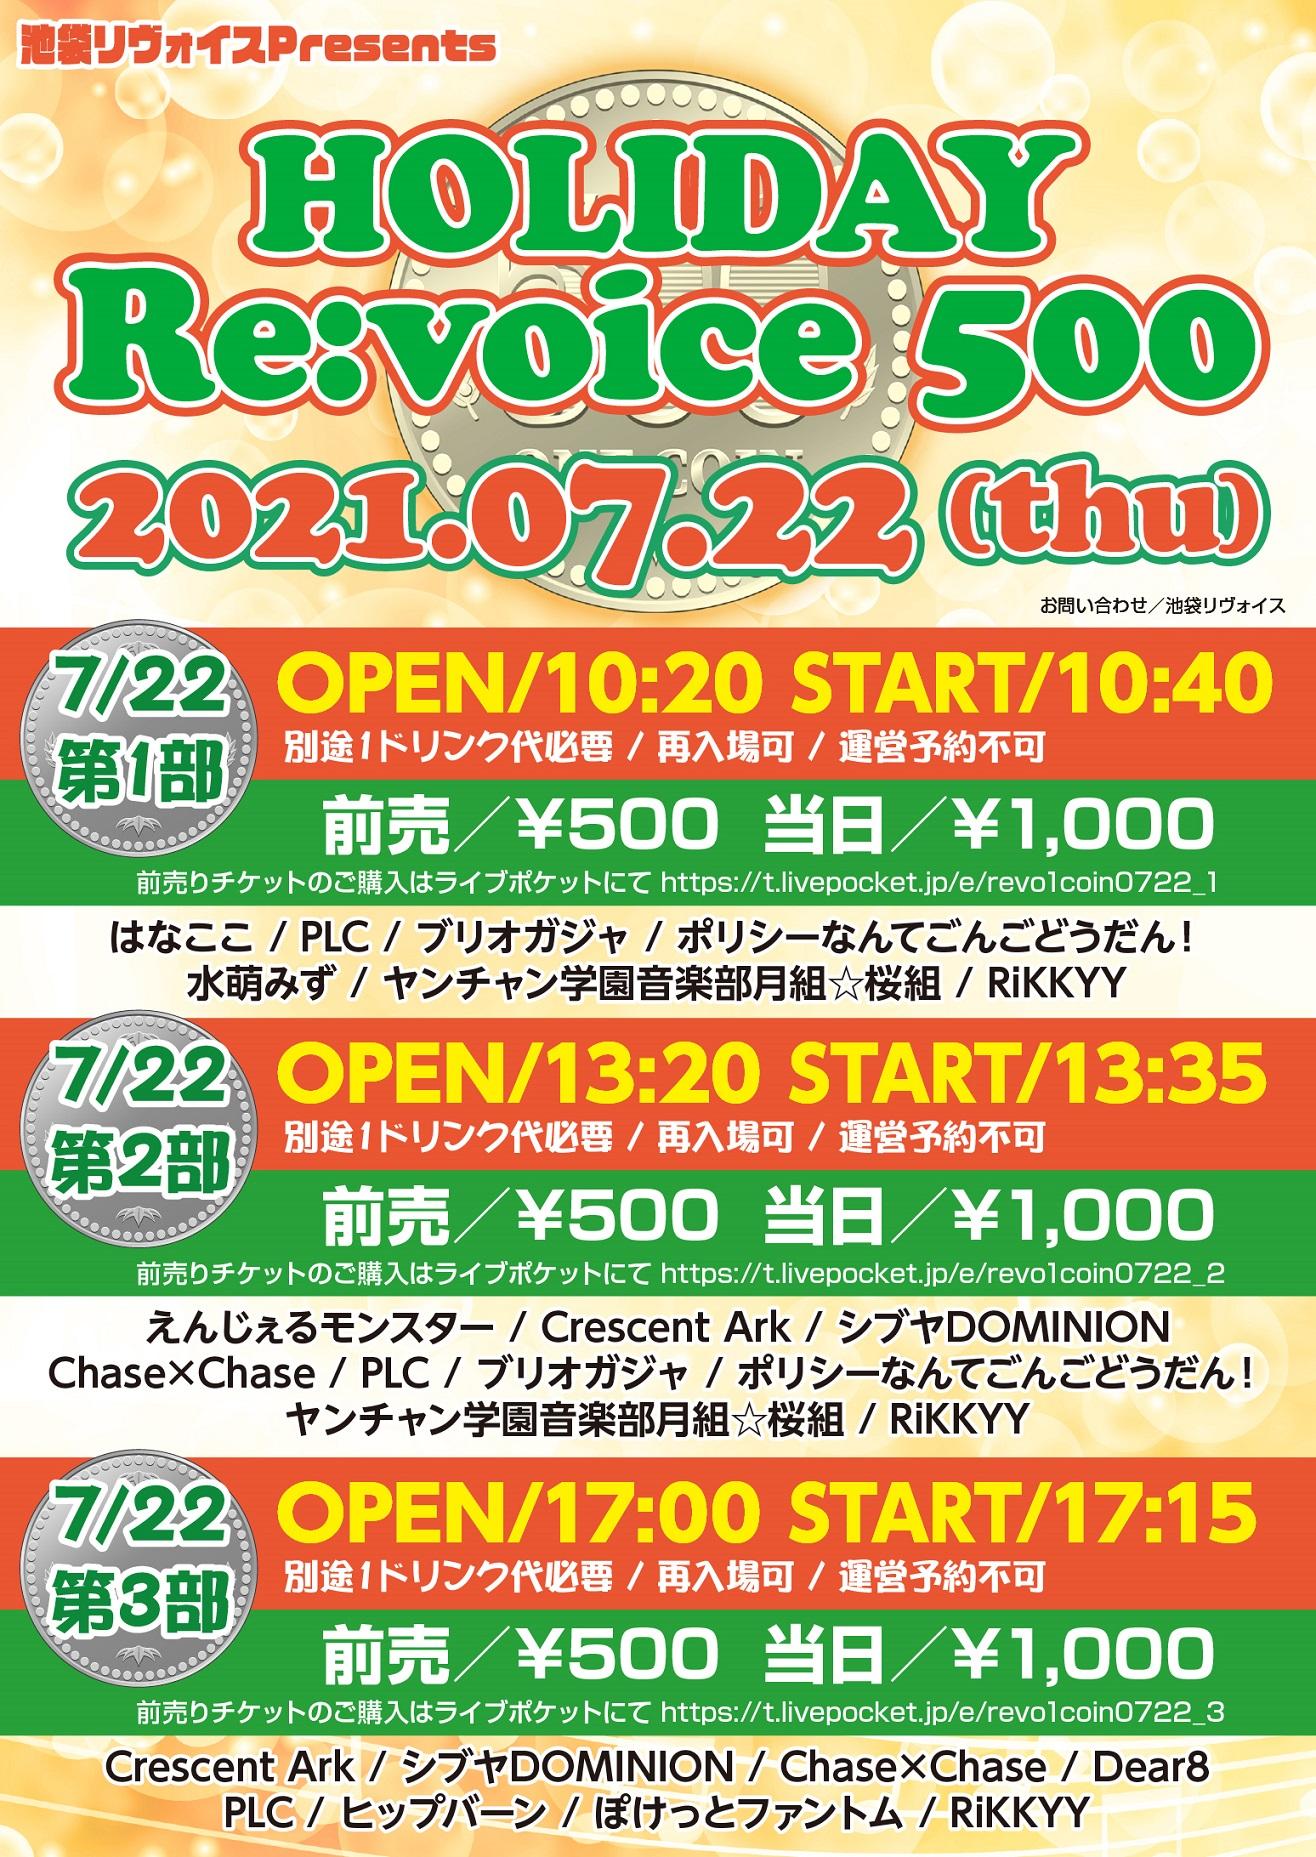 【第一部】HOLIDAY Re:voice 500